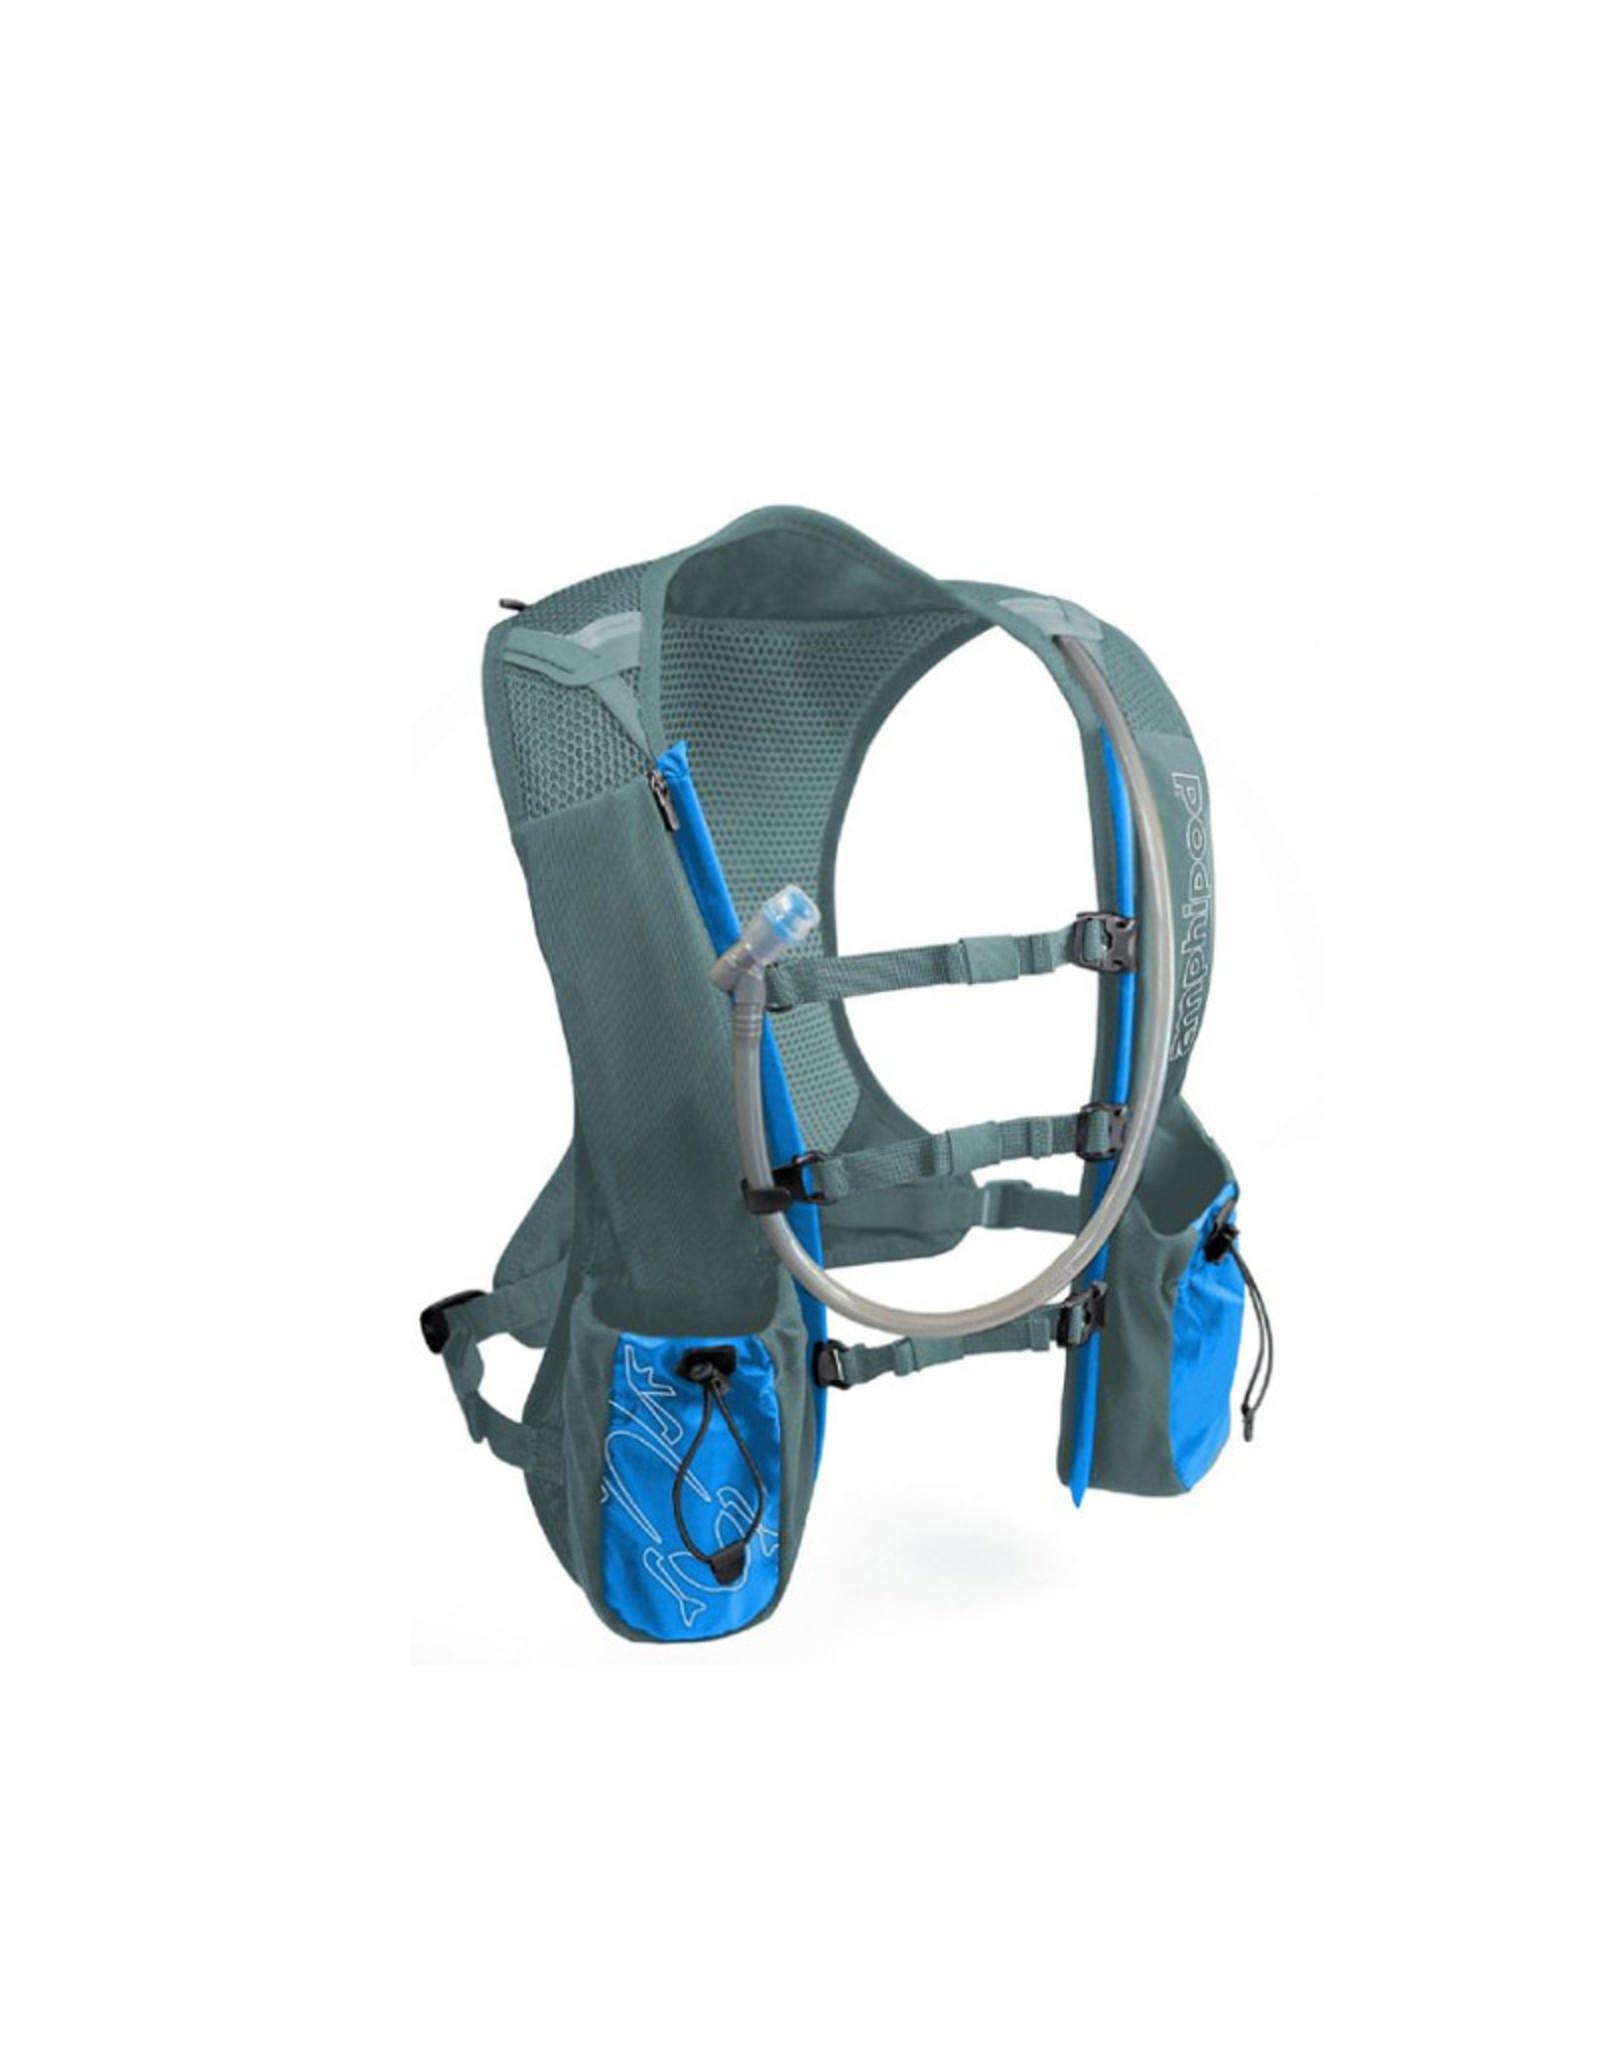 Amphipod PureRun Minimalist Vest  1.5L Reservoir